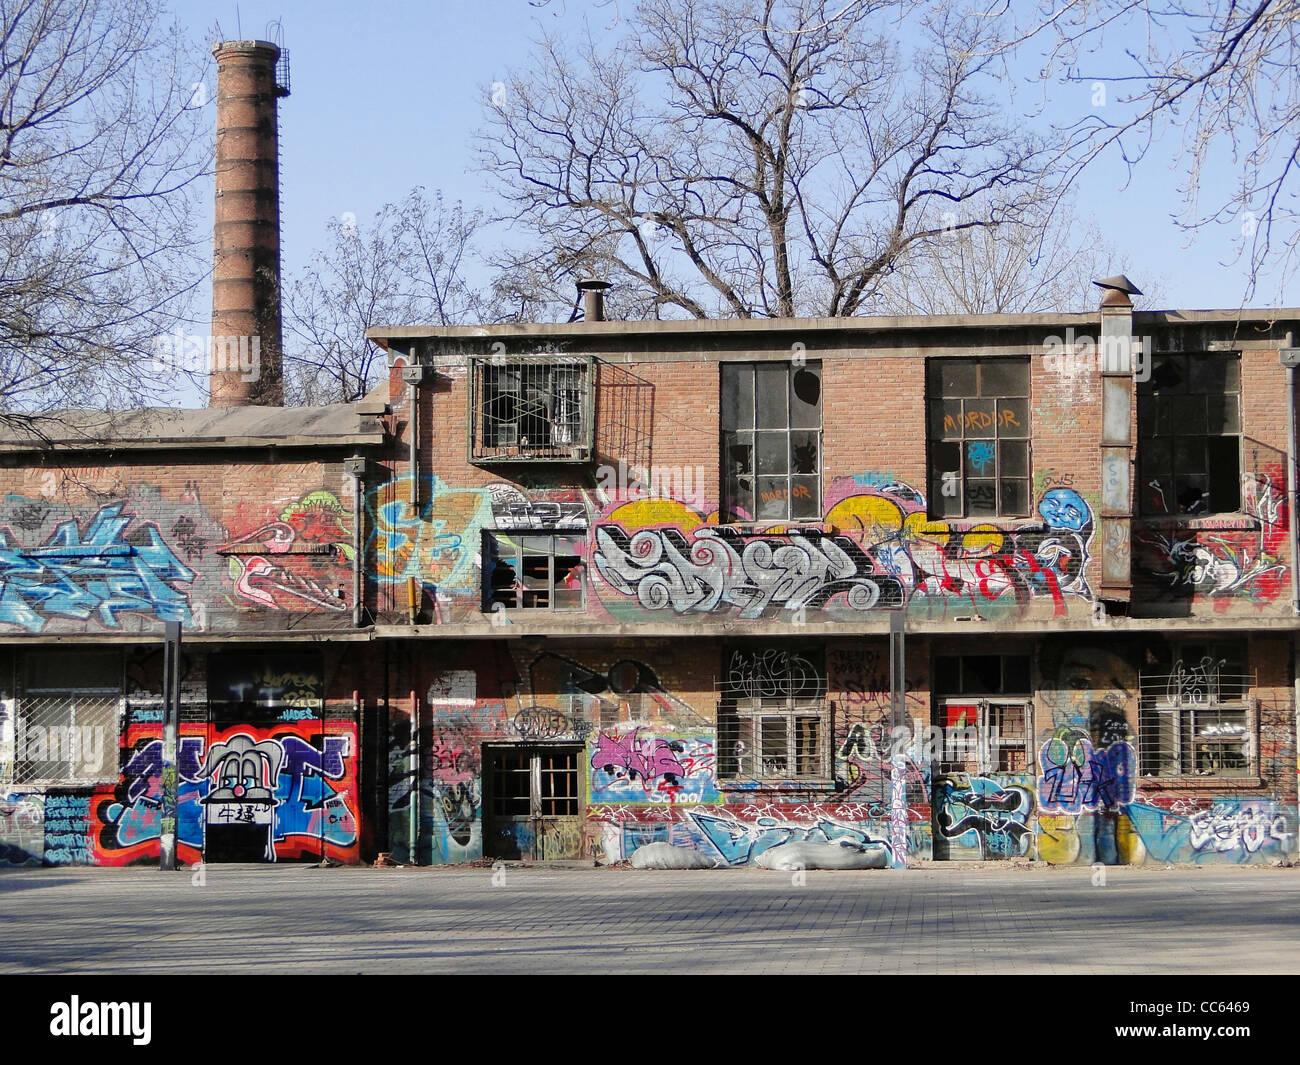 Abandoned workshop painted with graffiti, 798 Art Zone, Beijing, China - Stock Image